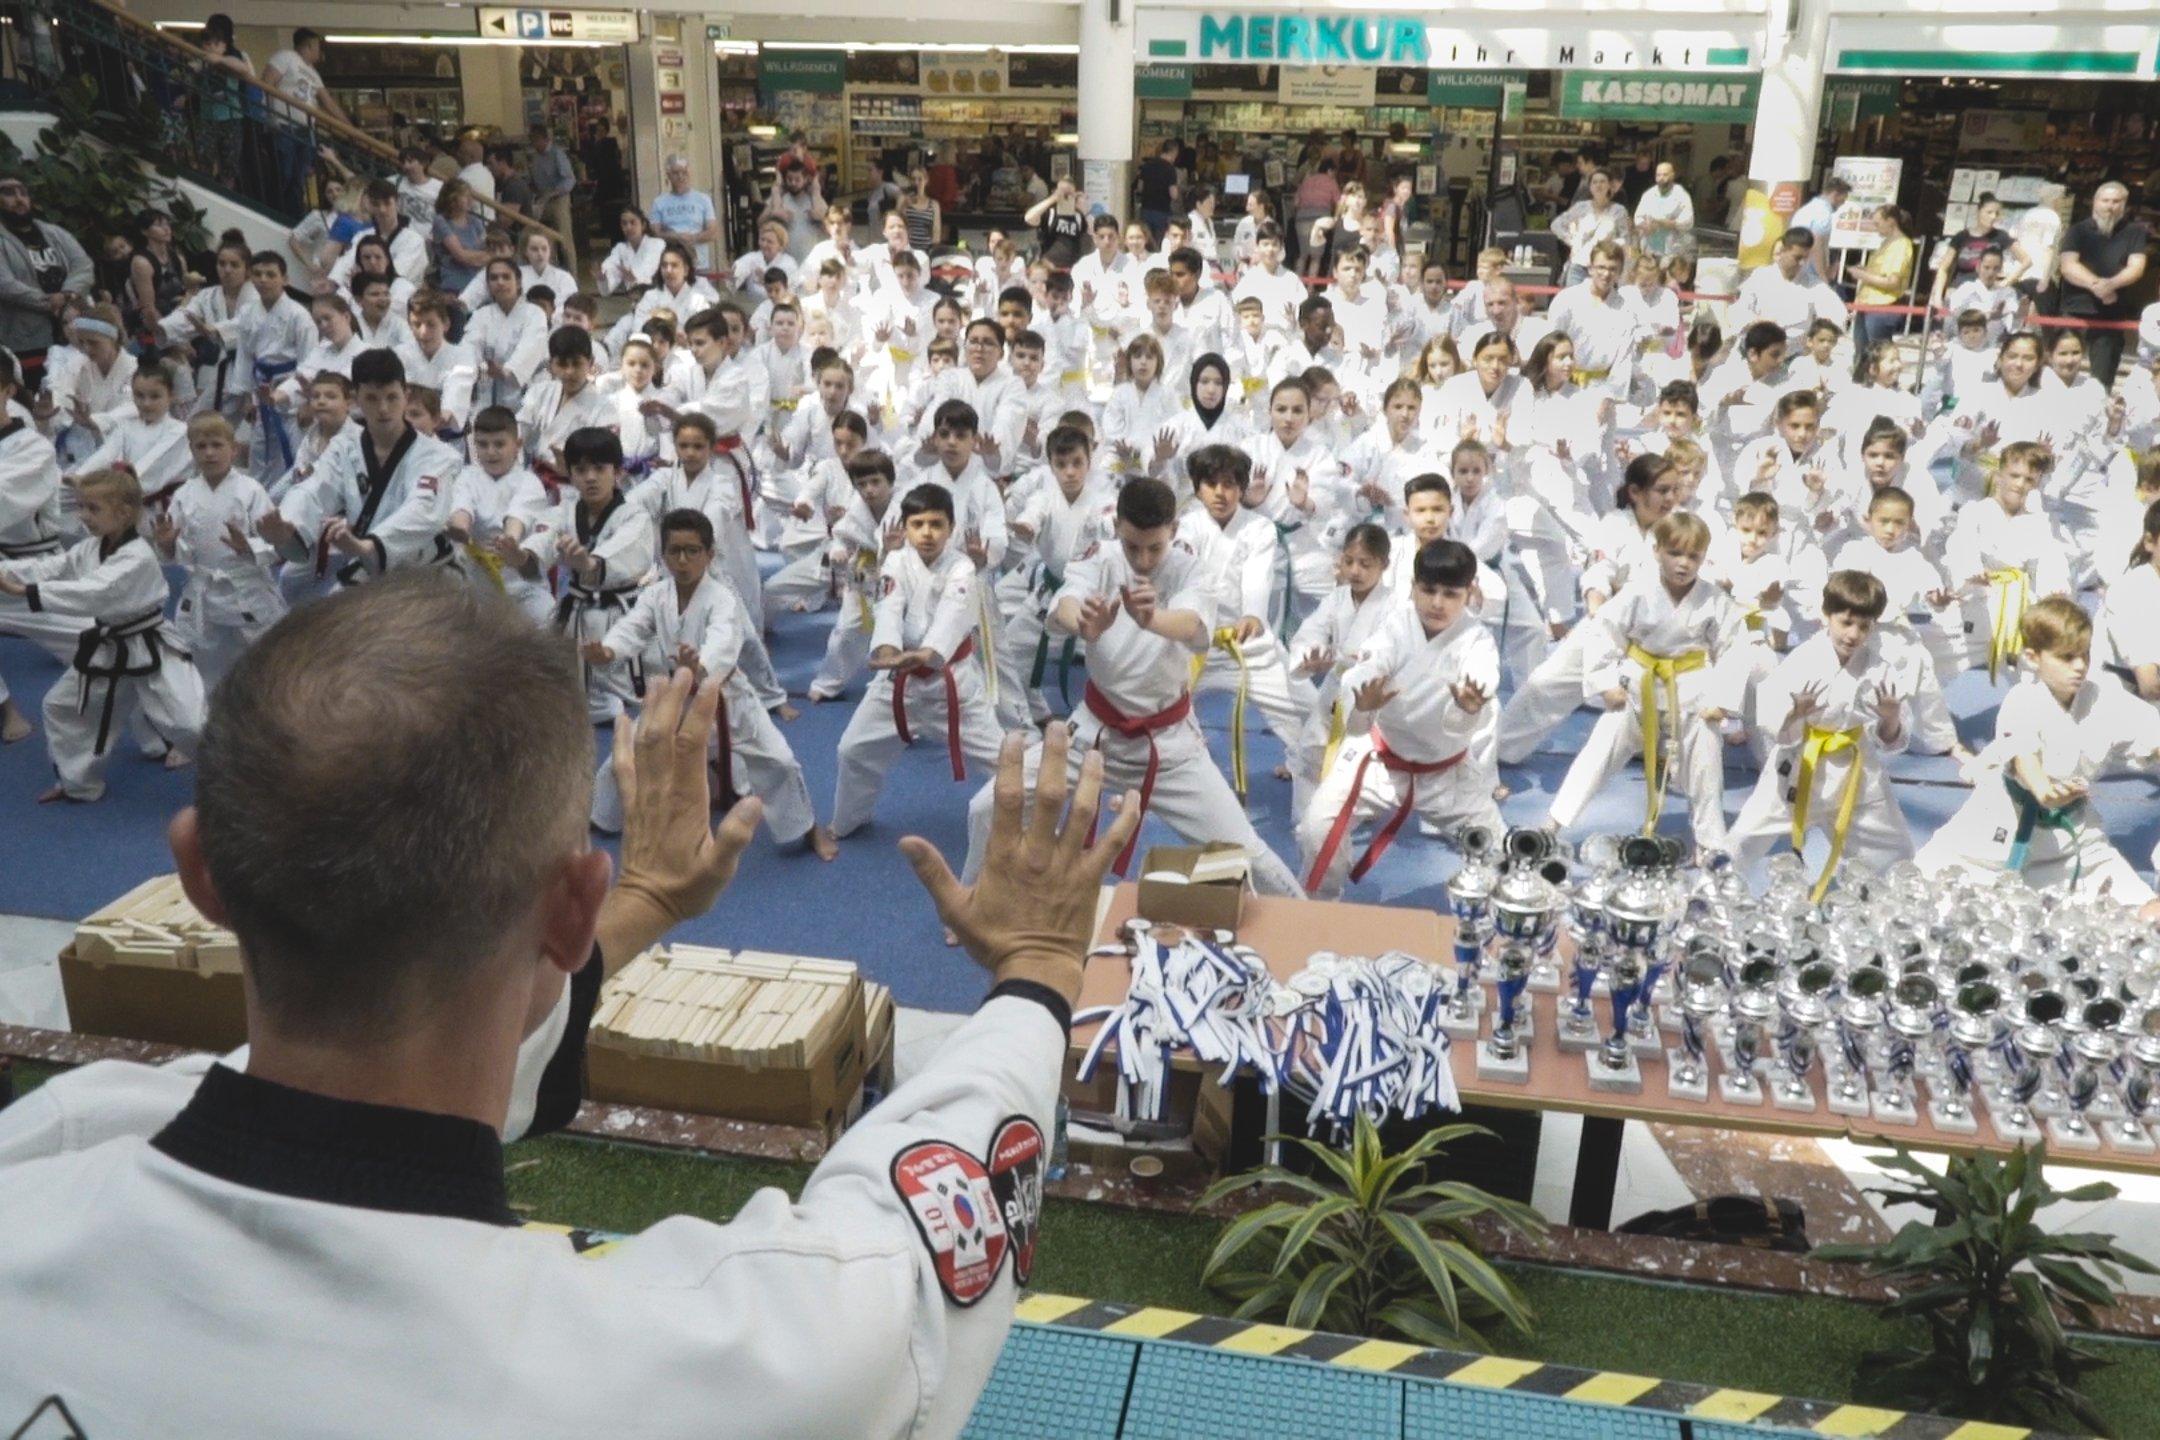 Sommerturnier Lugner City YOUNG-UNG Taekwondo Kampfsport